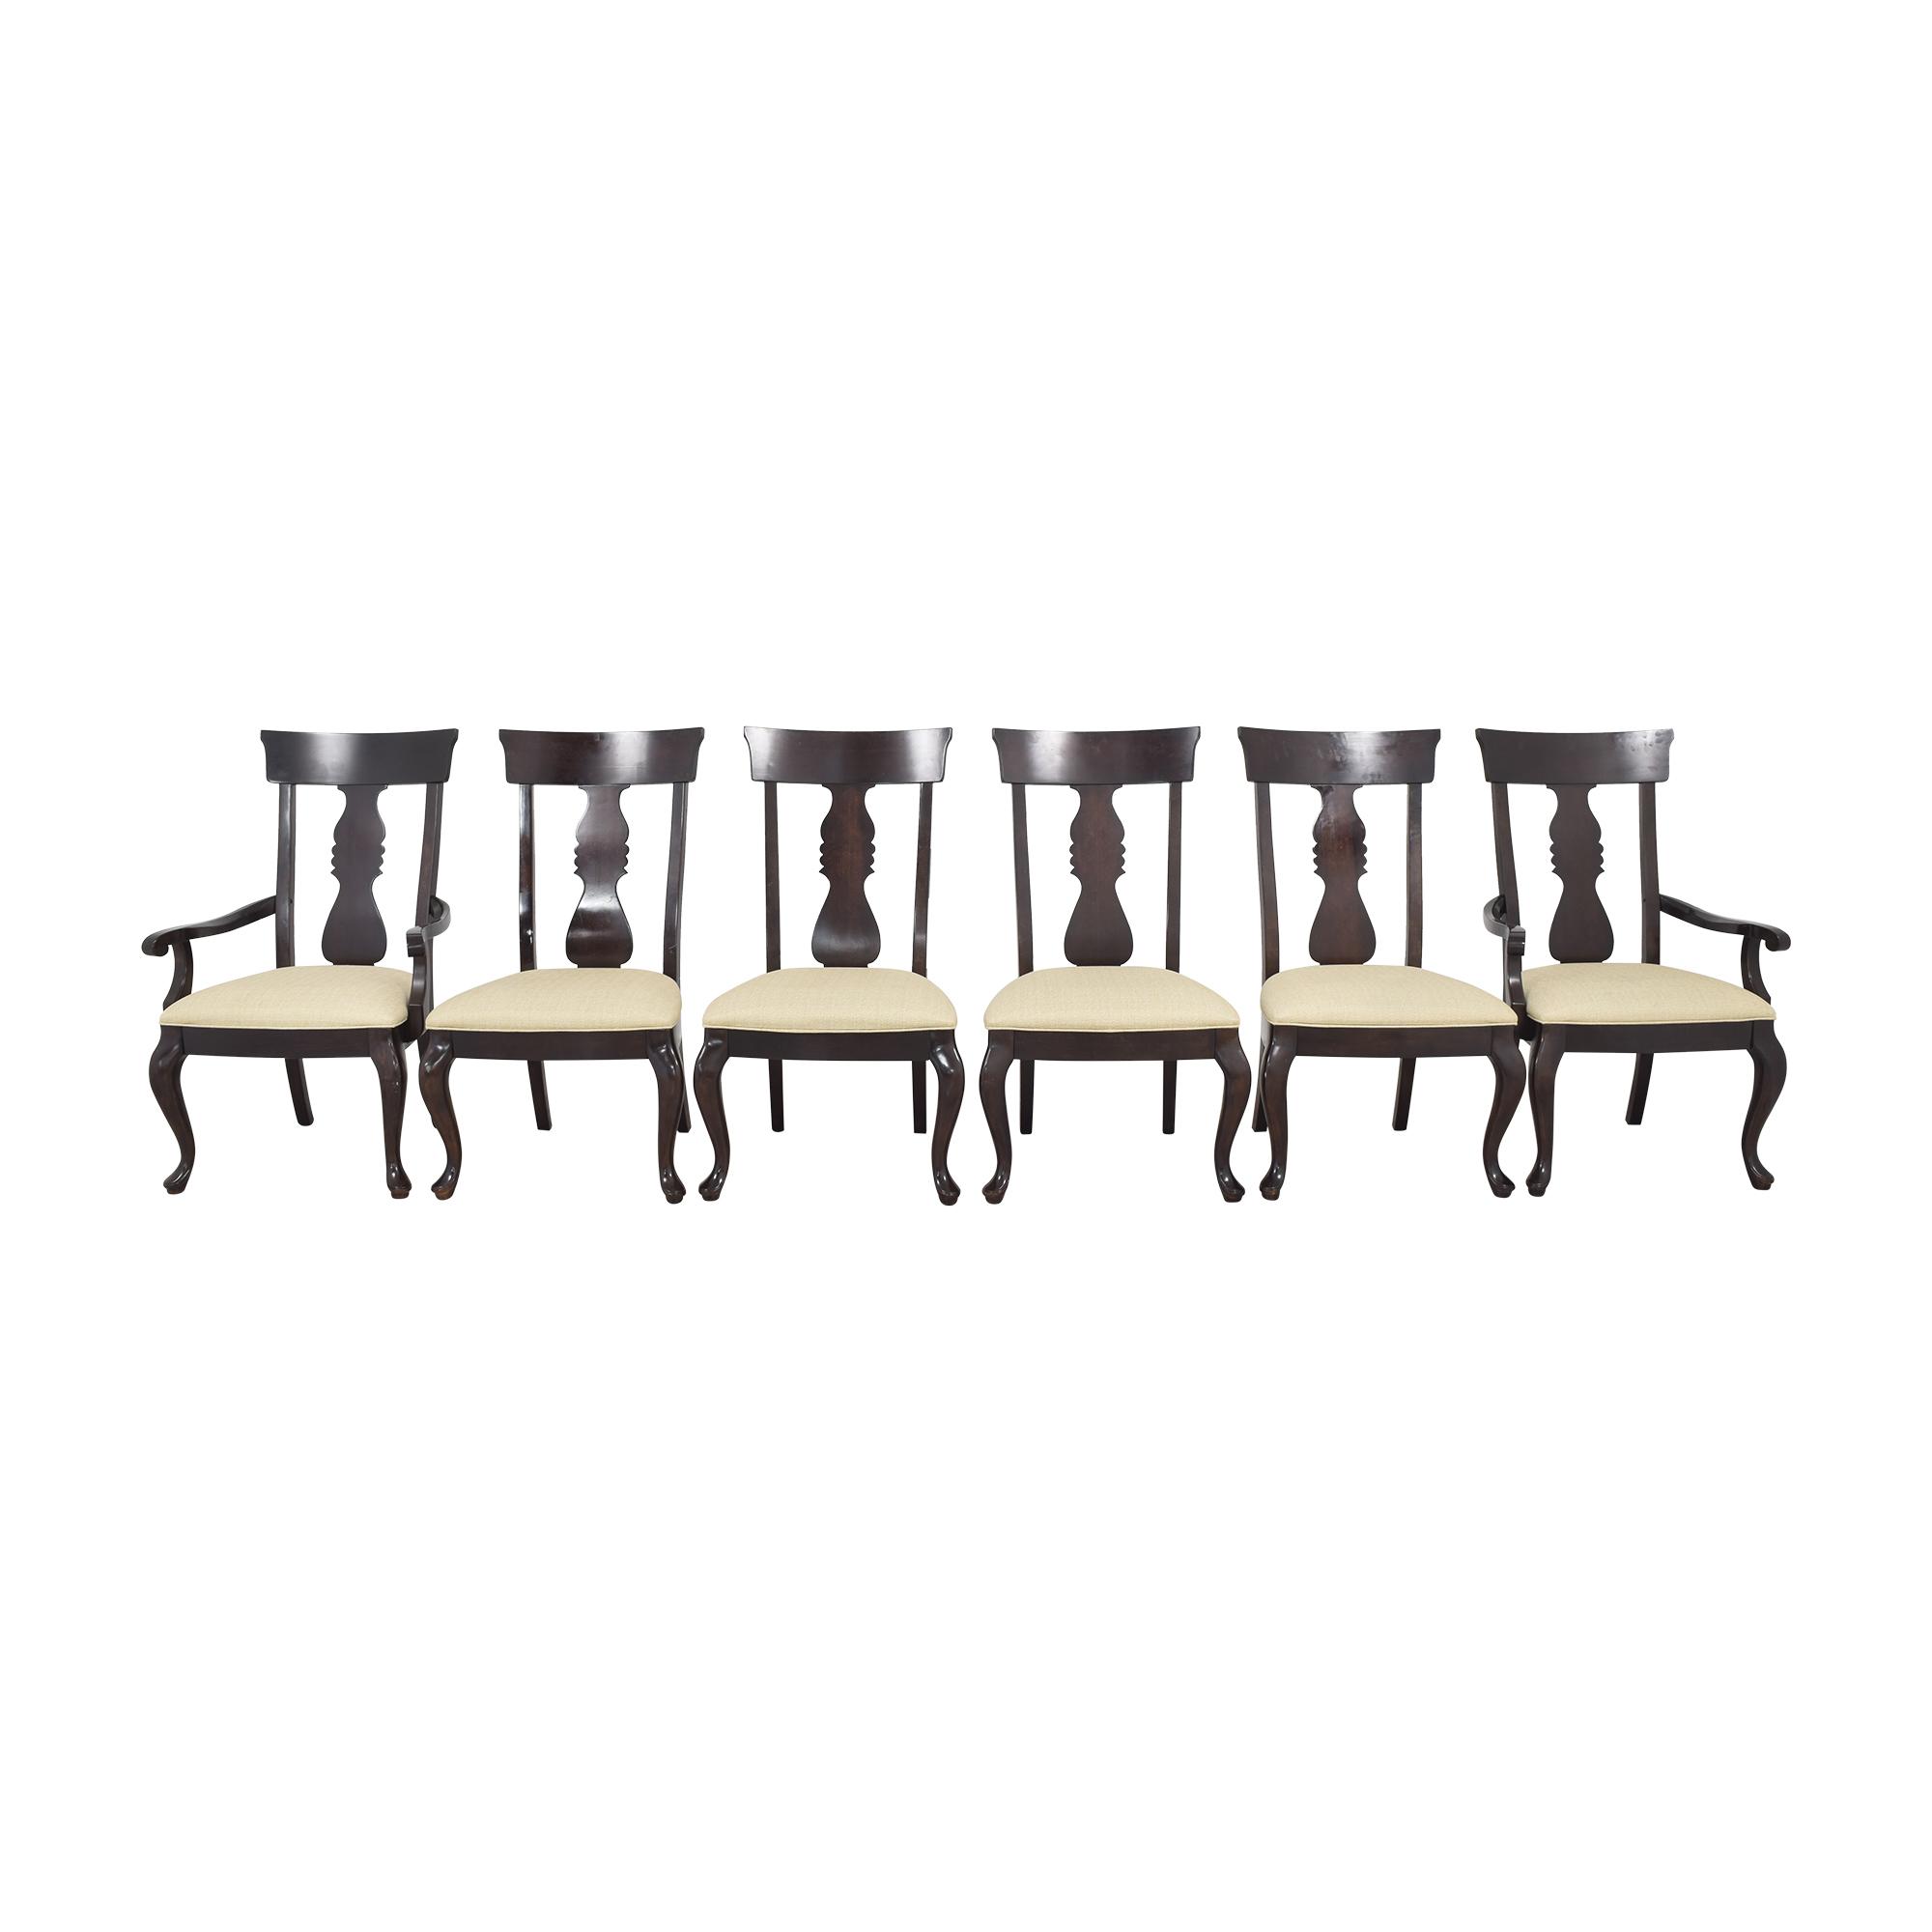 Thomasville Thomasville Fiddleback Dining Chairs nj